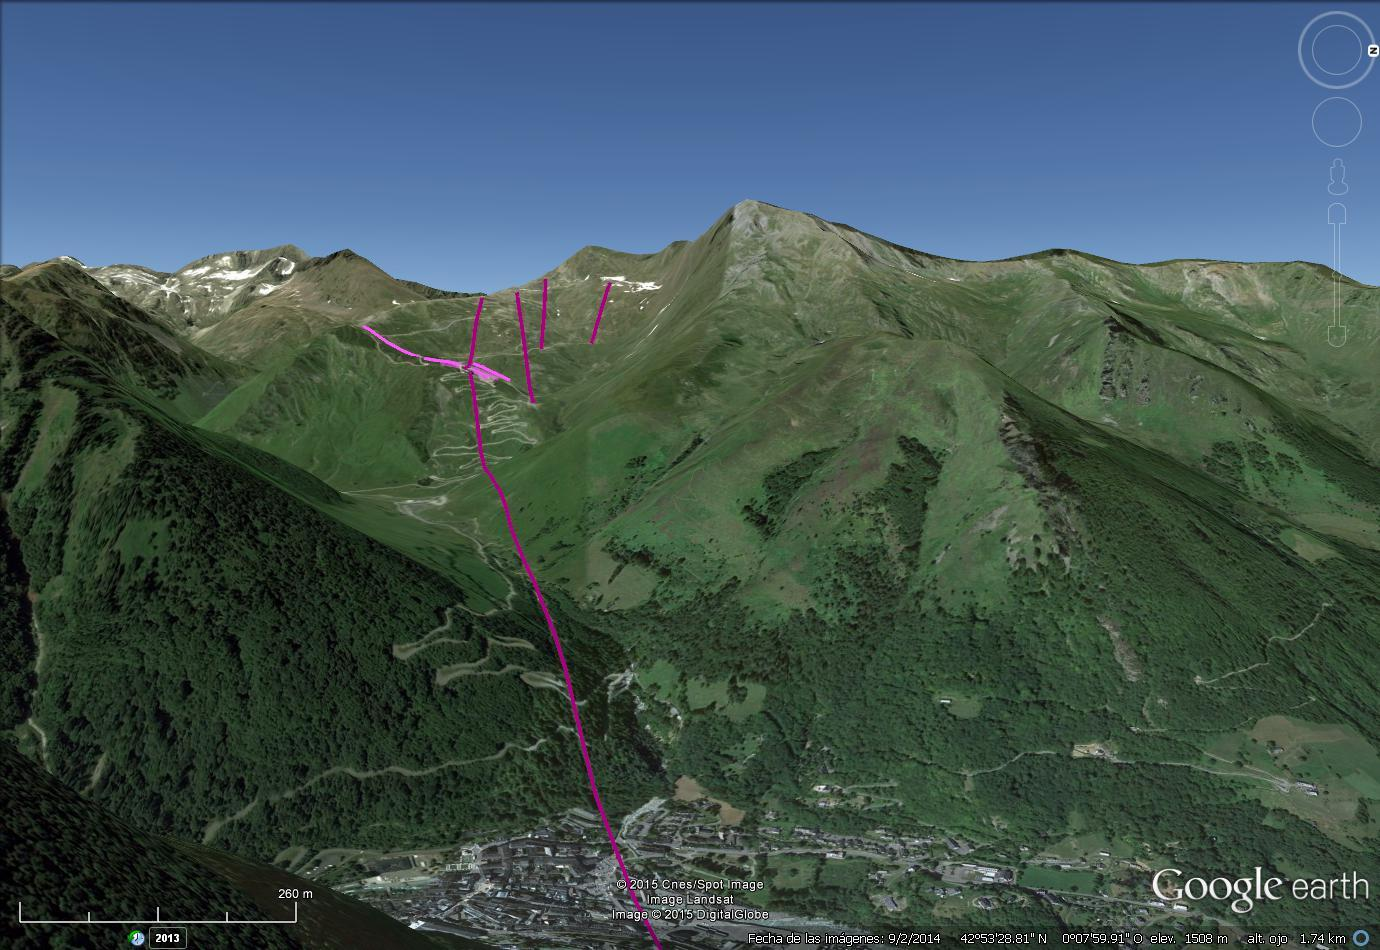 Vistas Google Earth Cauterets -Lys- 2015-16